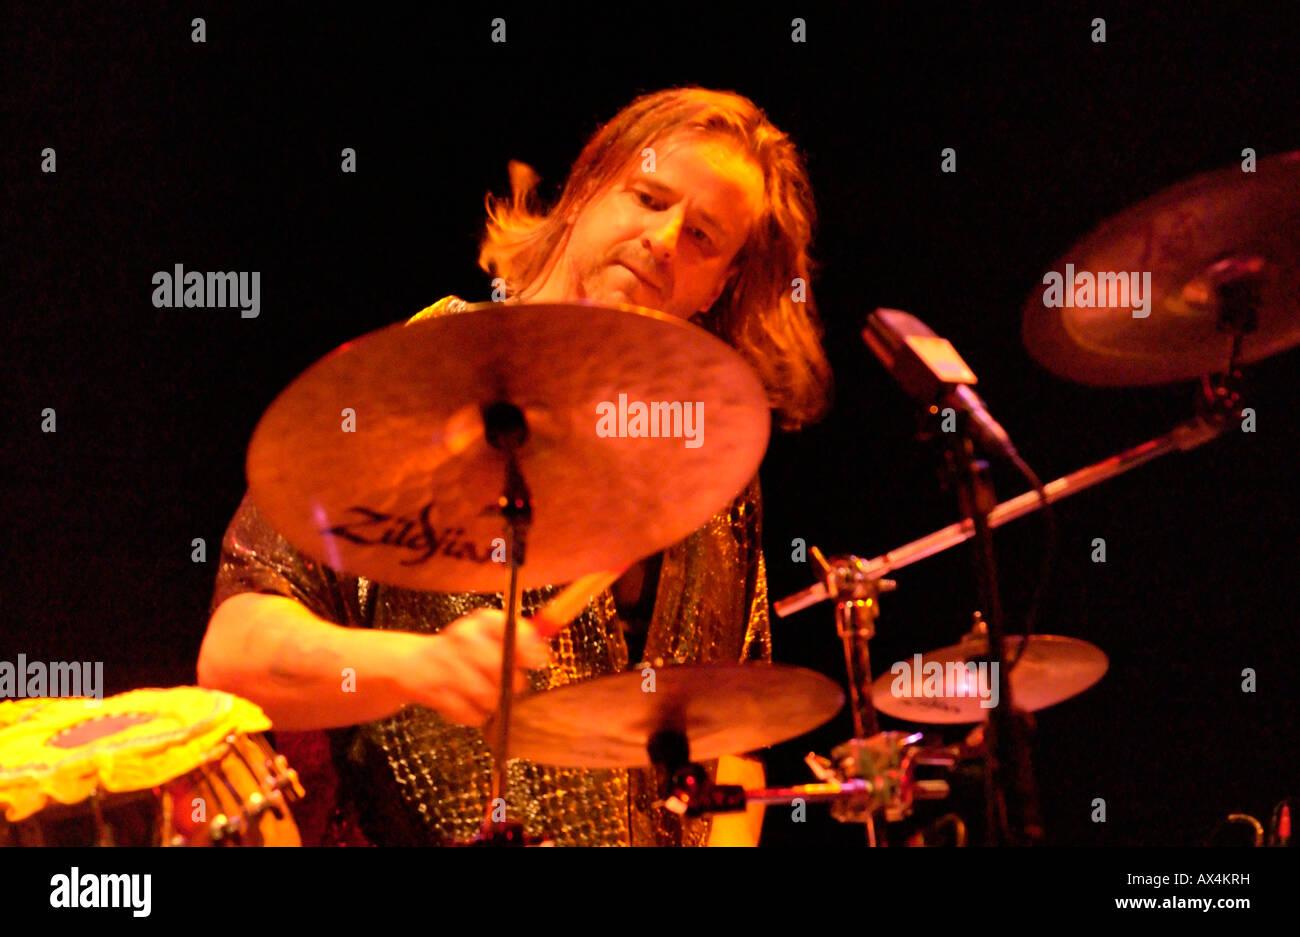 percussionist pete lockett at rhythm sticks festival, royal festival hall, london. 2004 - Stock Image